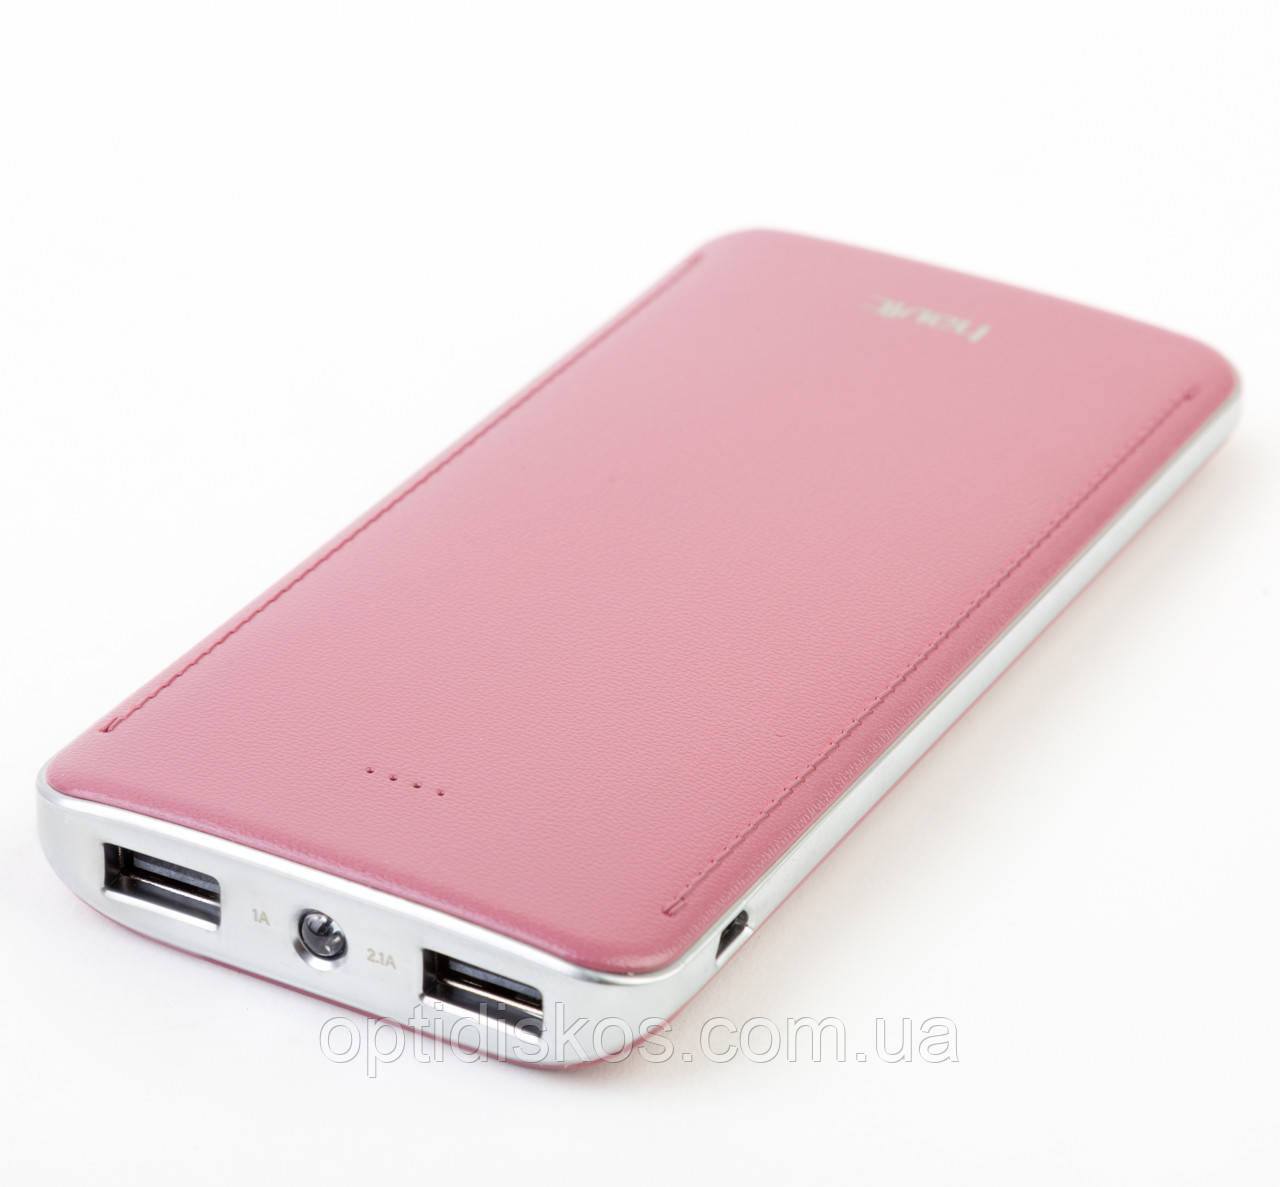 Повербанк Havit HV-PB005X, 10000mAh, 2.1А, розовый